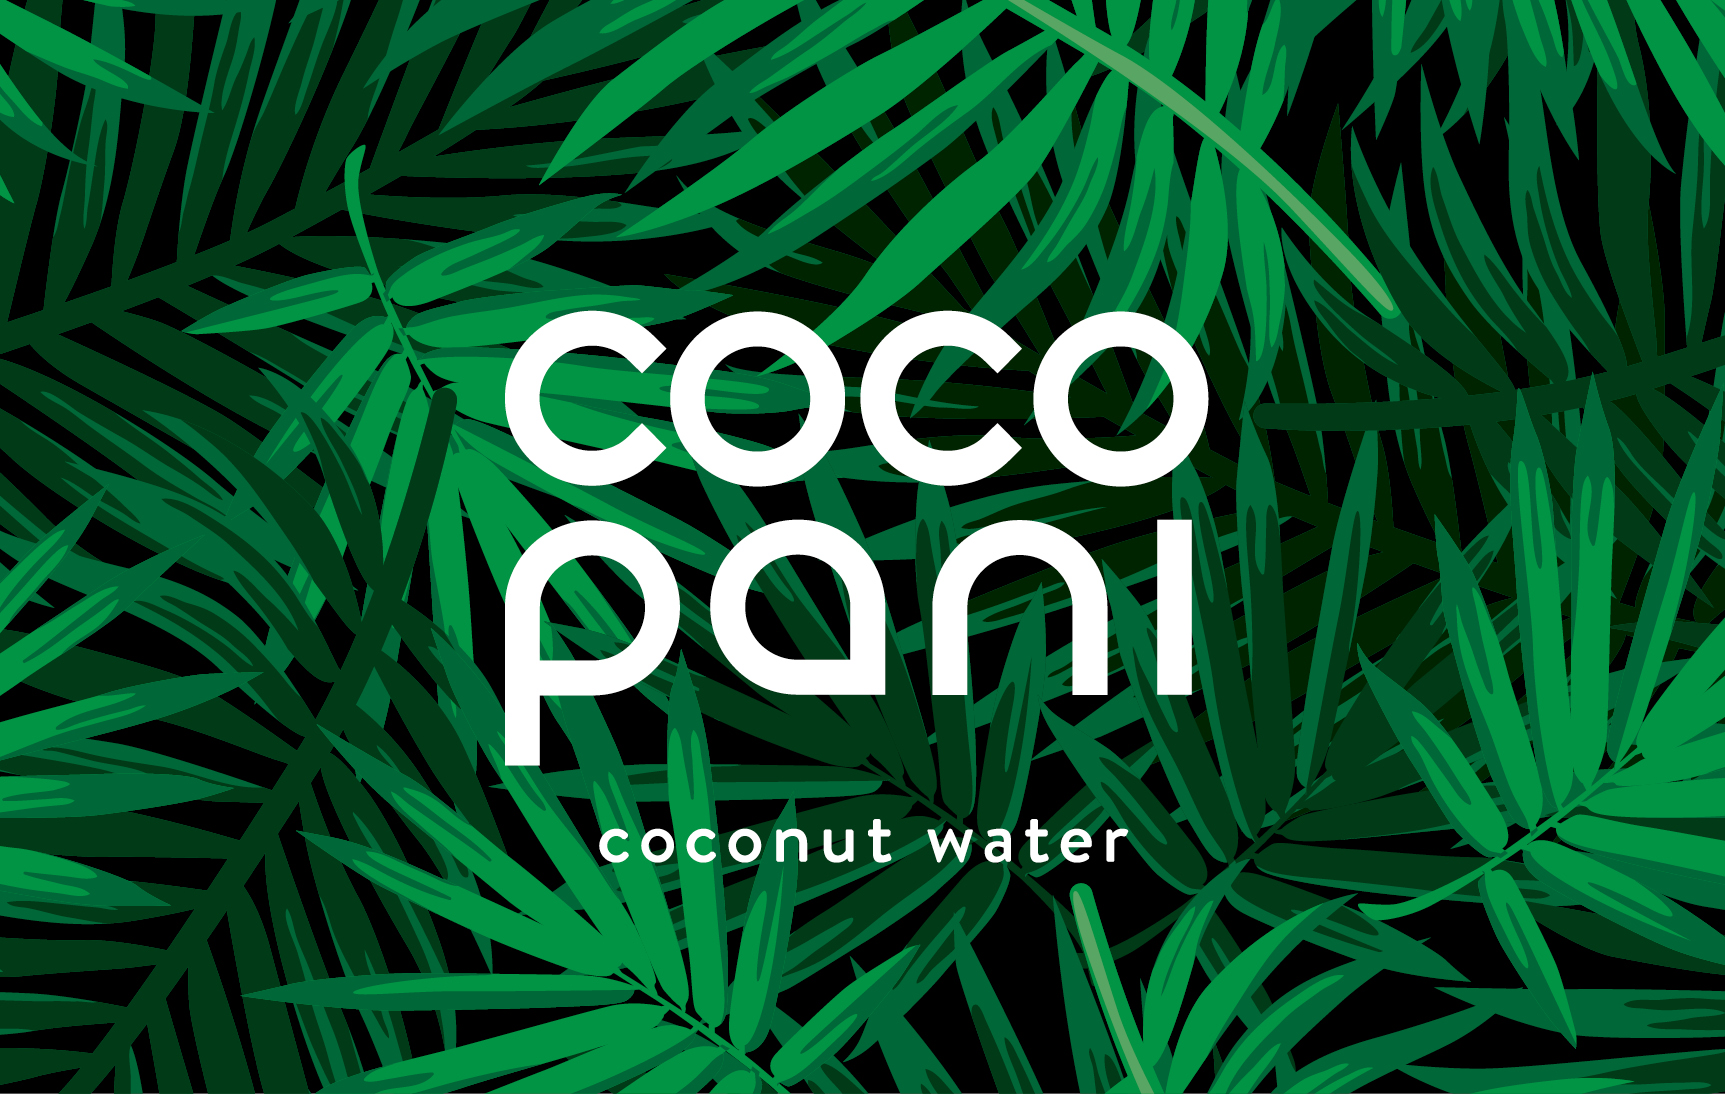 Coco Pani - Coconut water